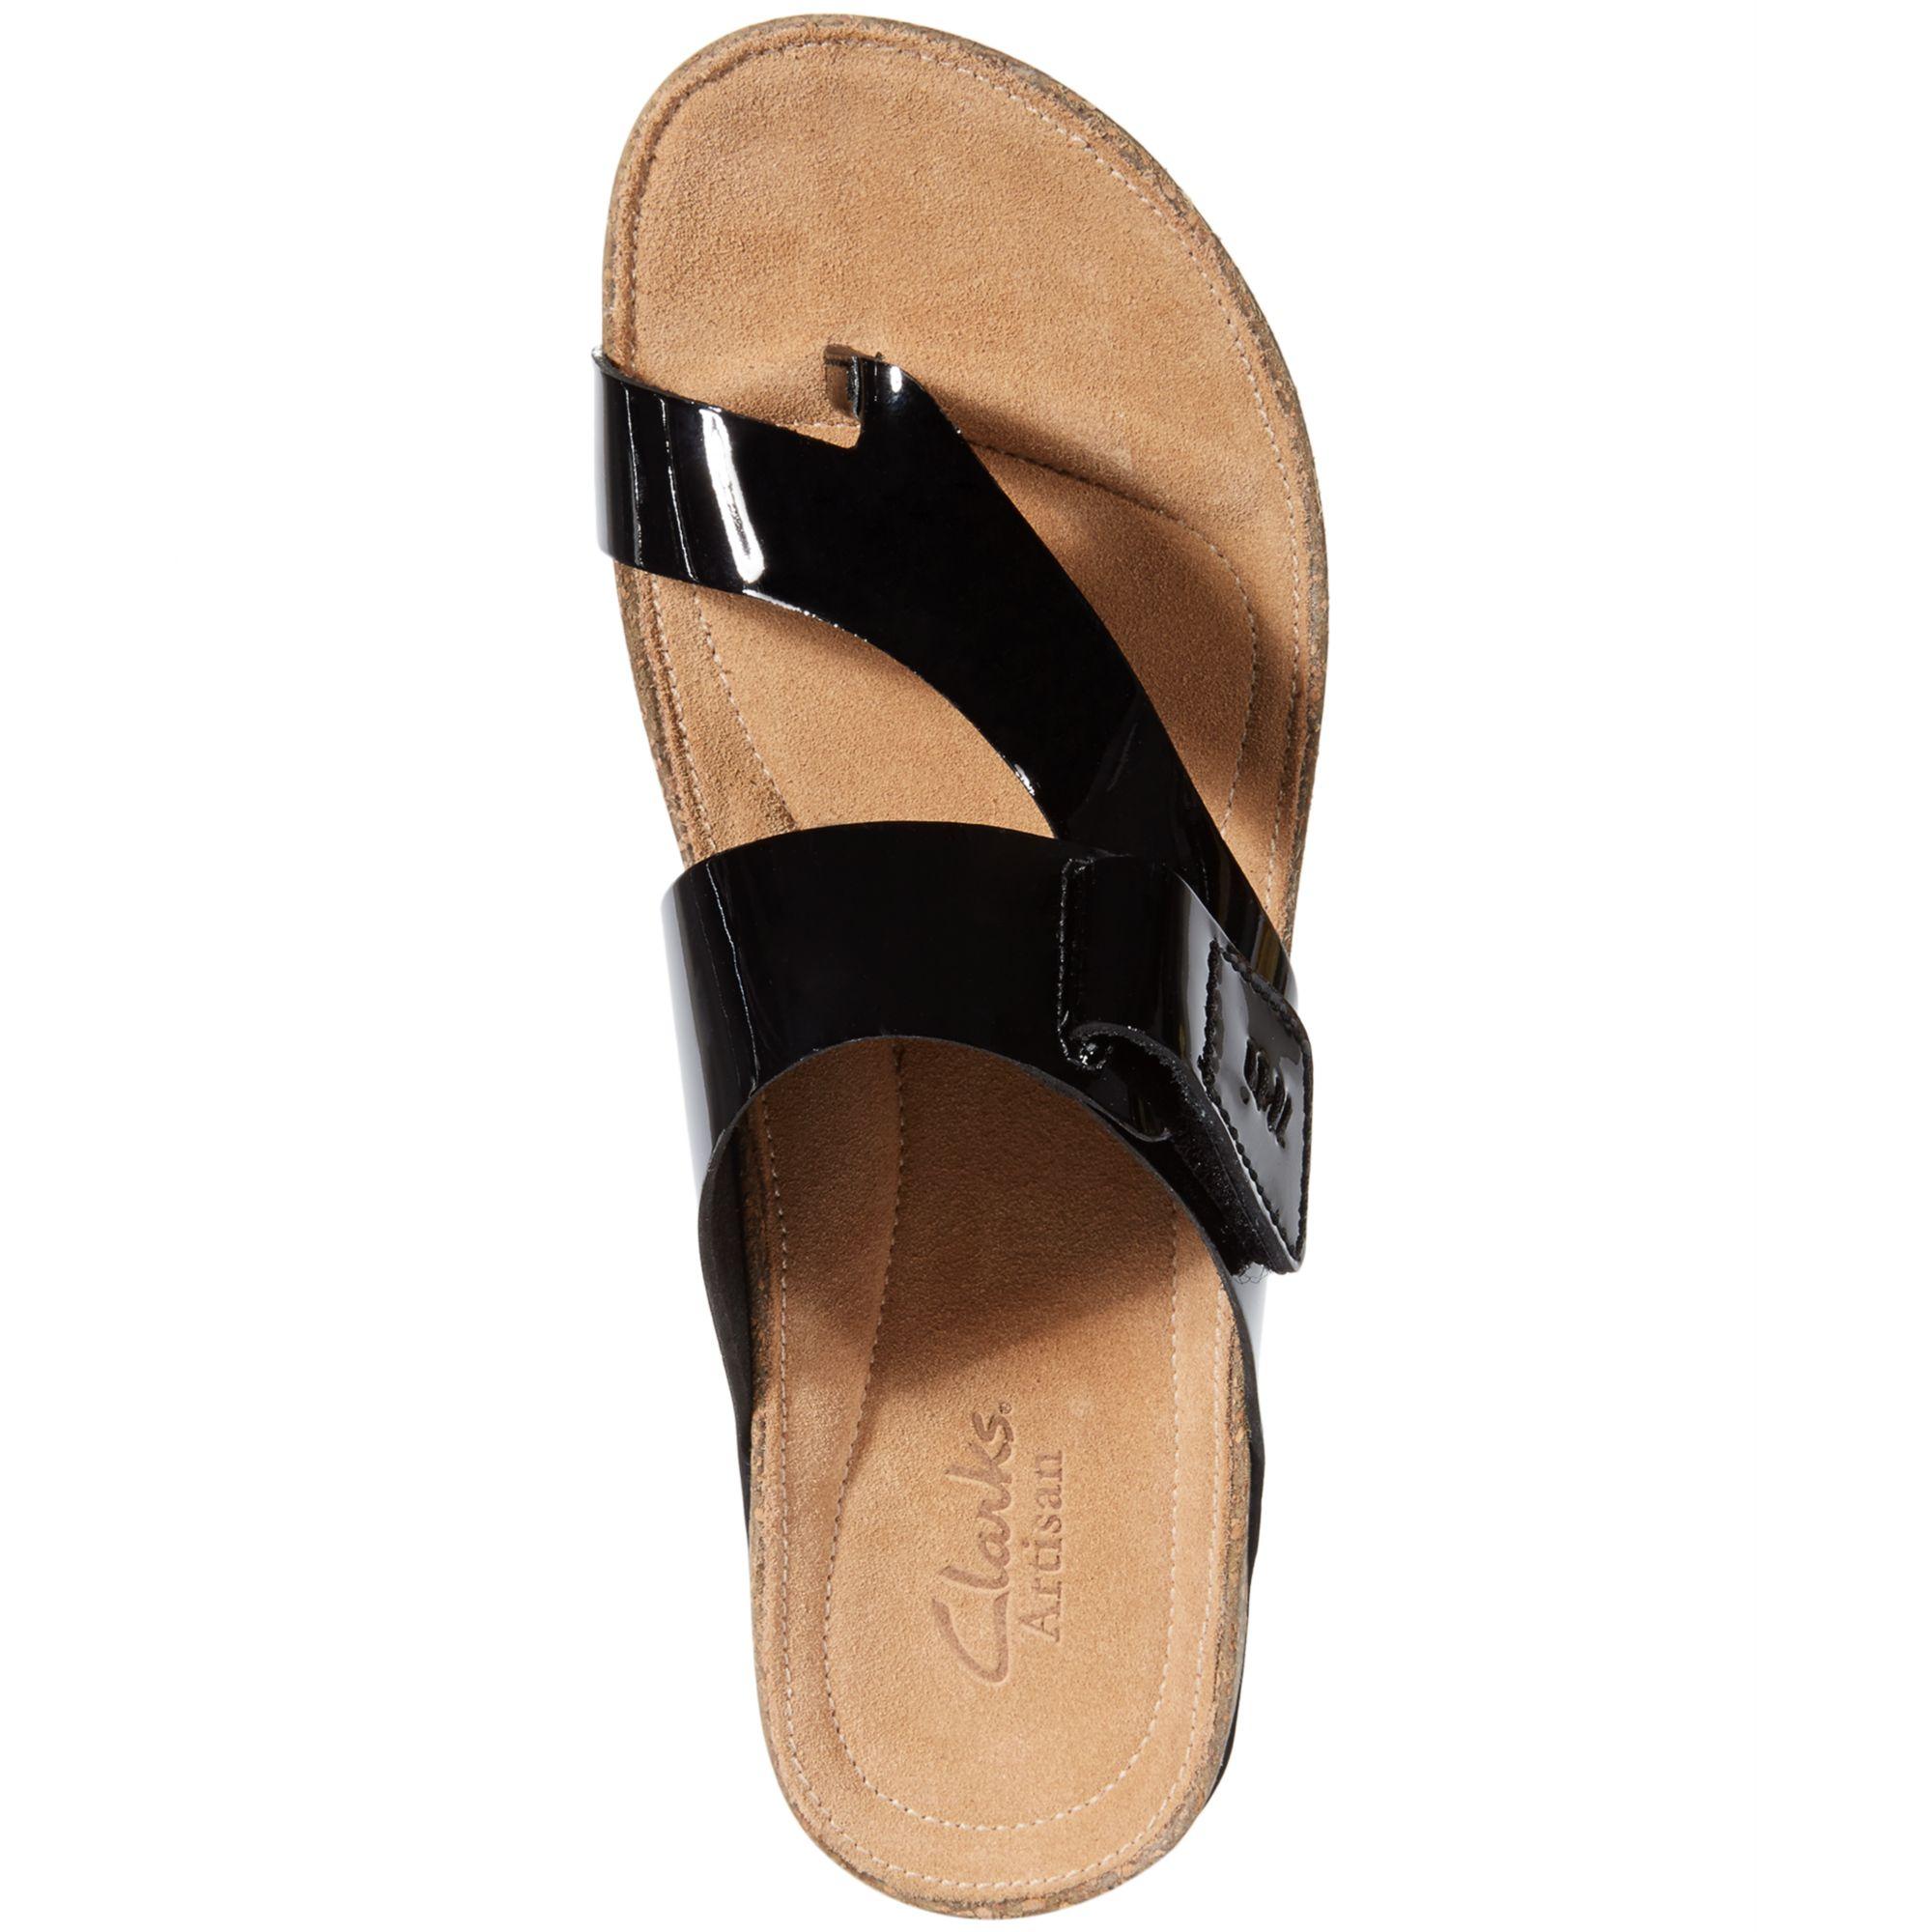 7fa46e35a5c9d6 Lyst - Clarks Womens Artisan Perri Coast Footbed Sandals in Black